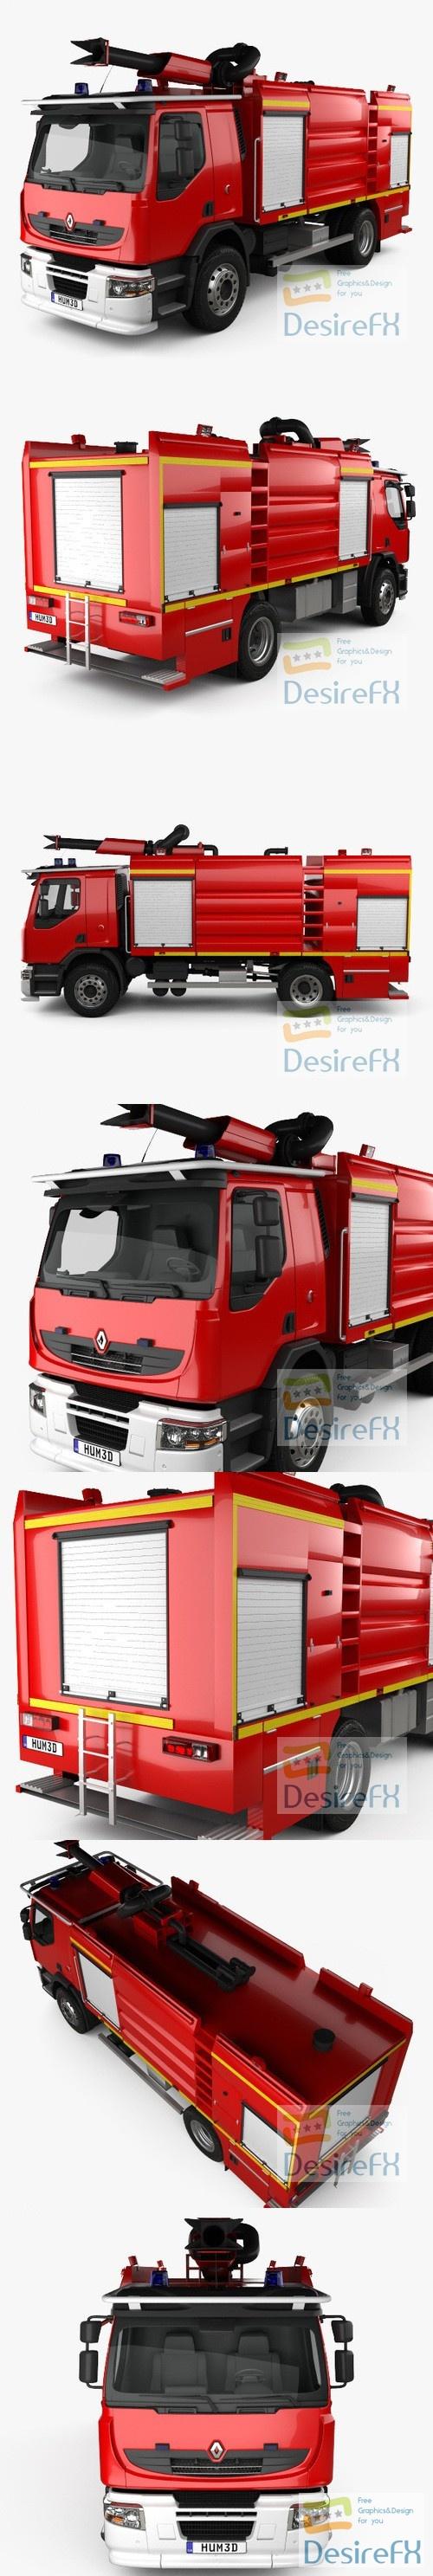 Renault Premium Lander Fire Truck 2011 3D Model